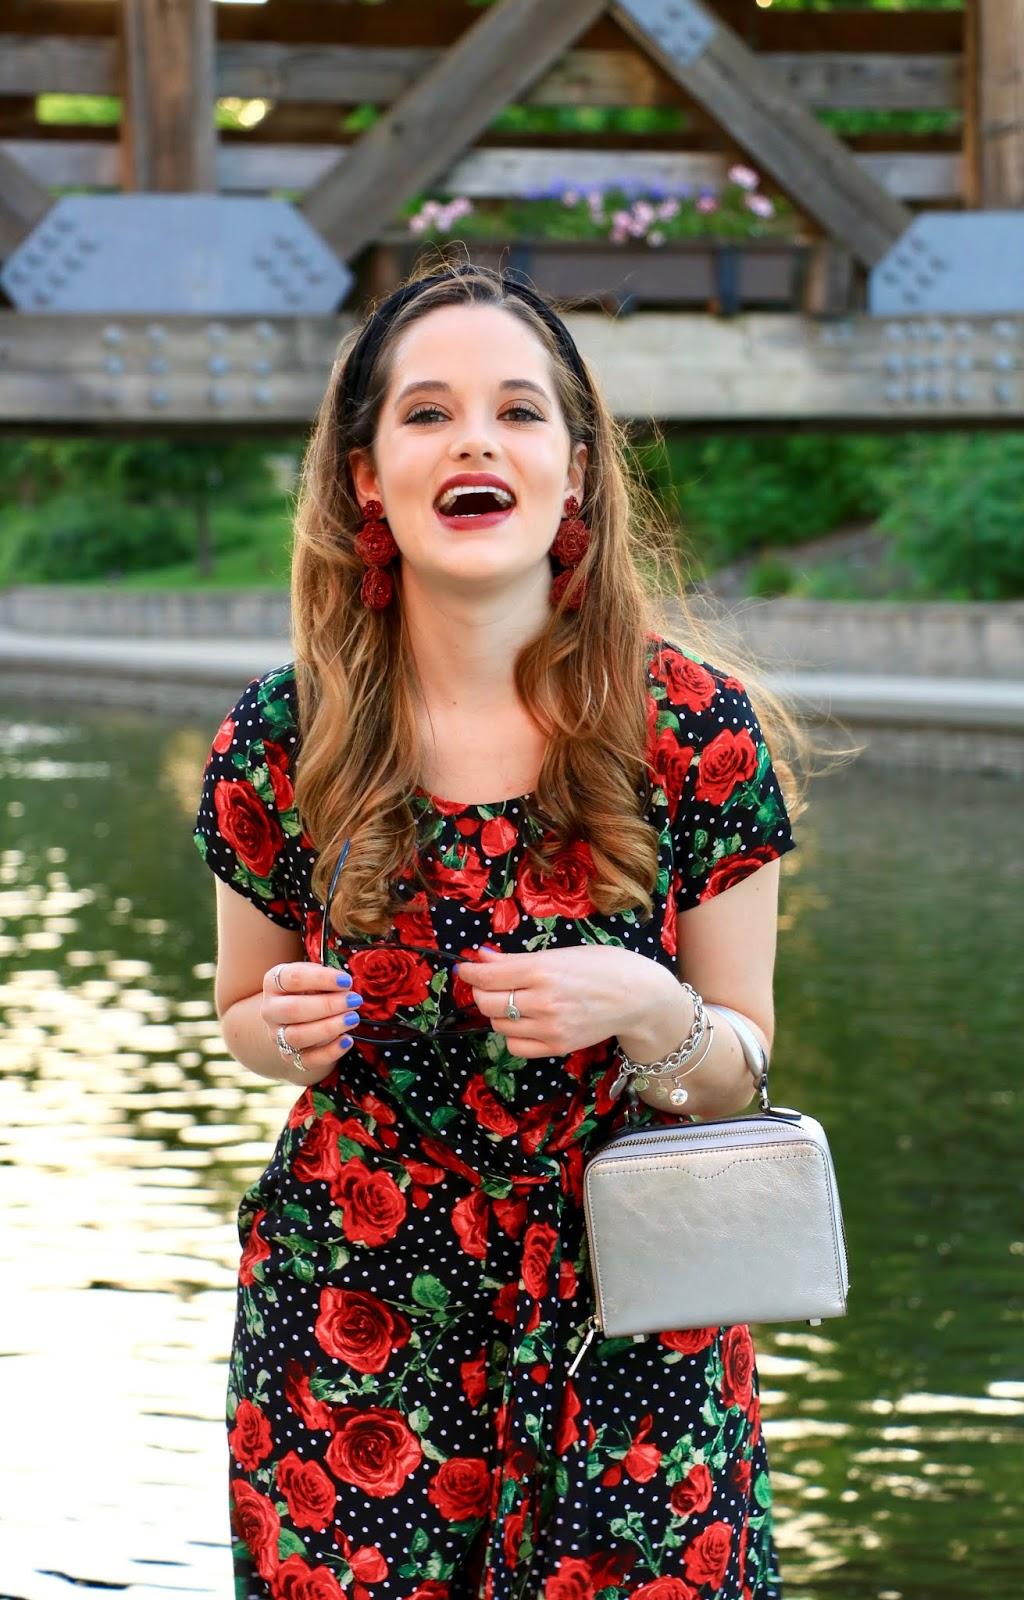 Nyc fashion blogger Kathleen Harper